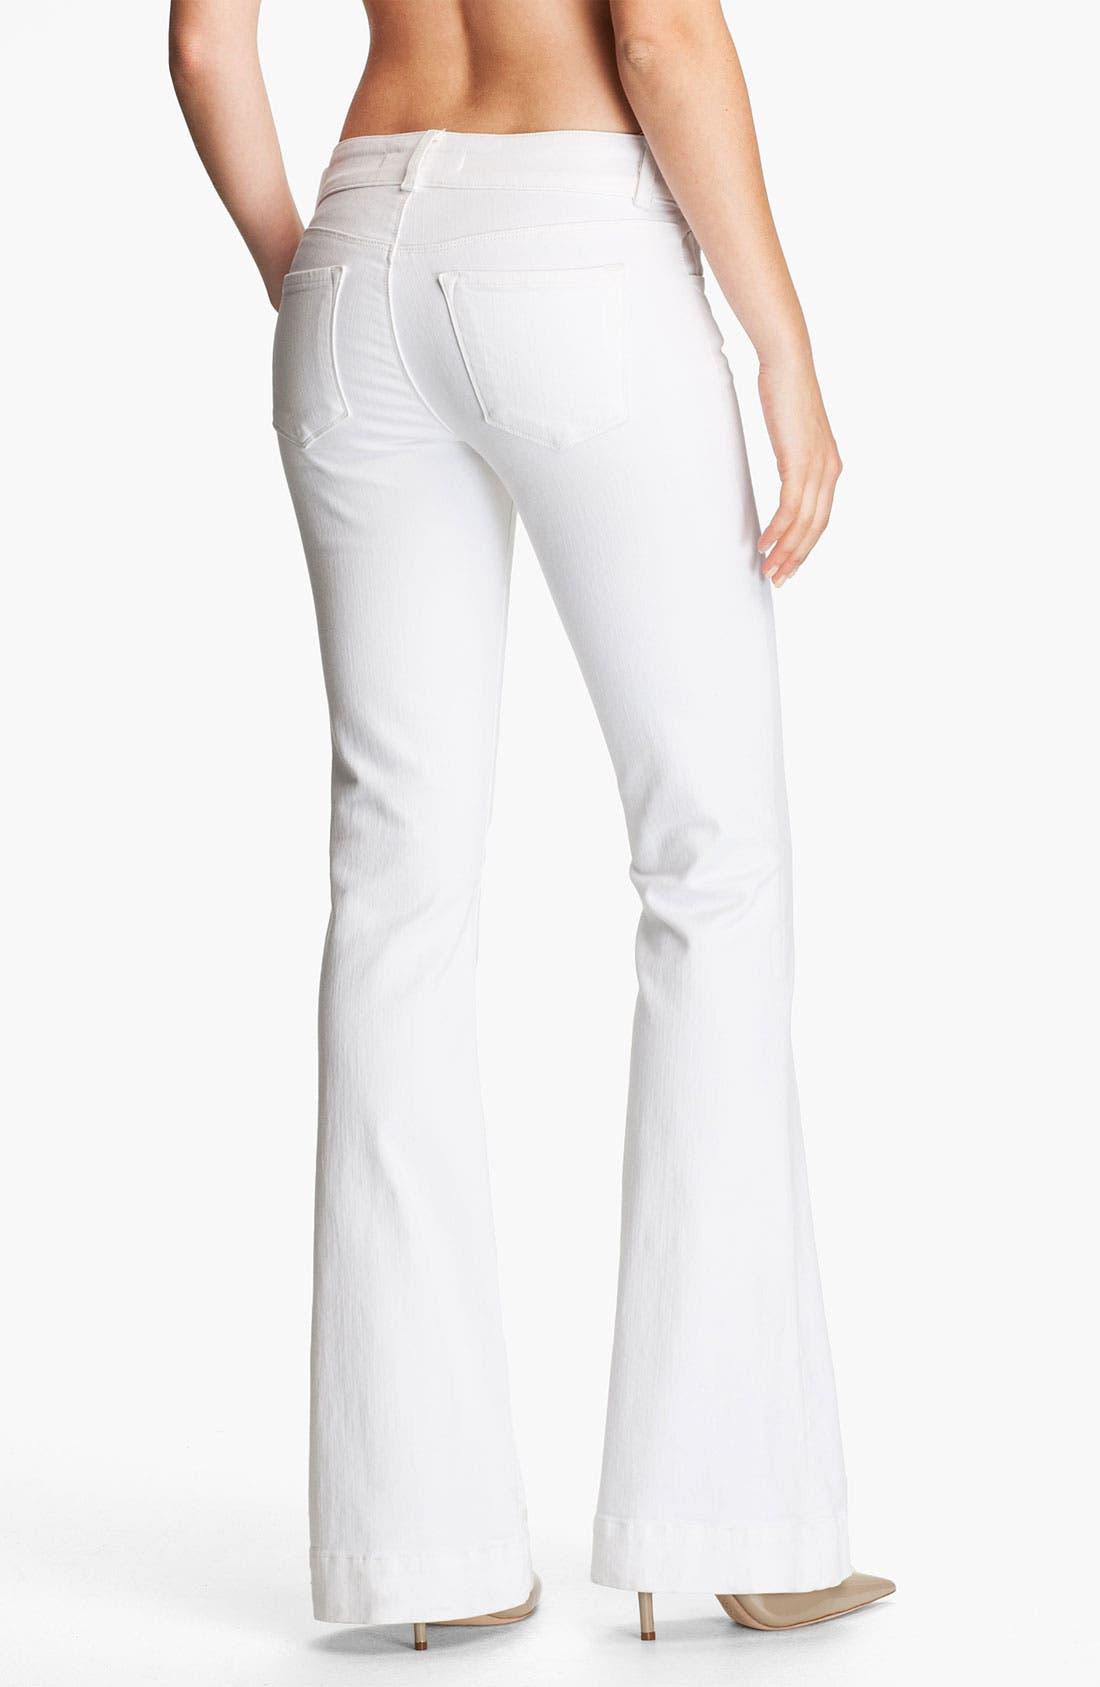 Alternate Image 2  - J Brand Low Rise Bell Bottom Stretch Jeans (Blanc)